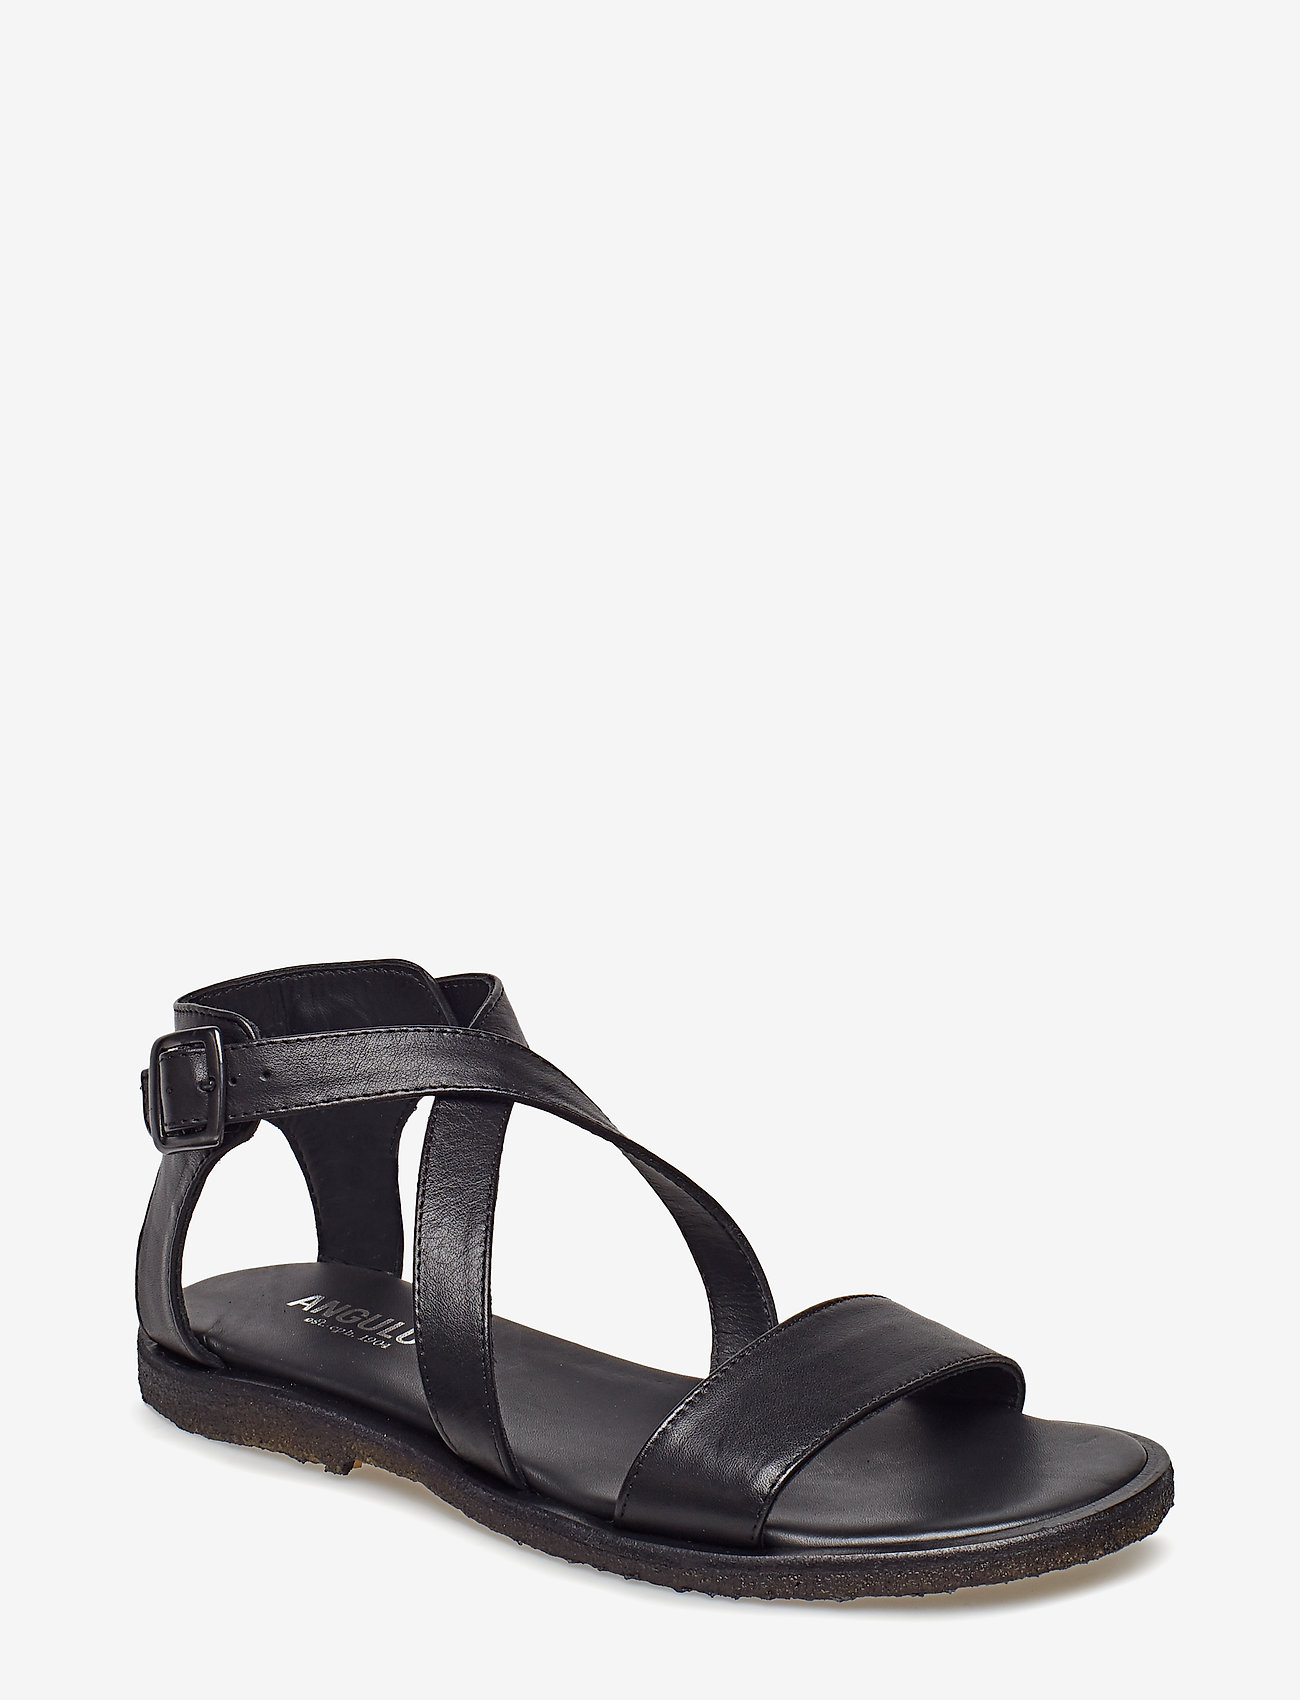 ANGULUS - 5442 - platte sandalen - 1604 black - 0